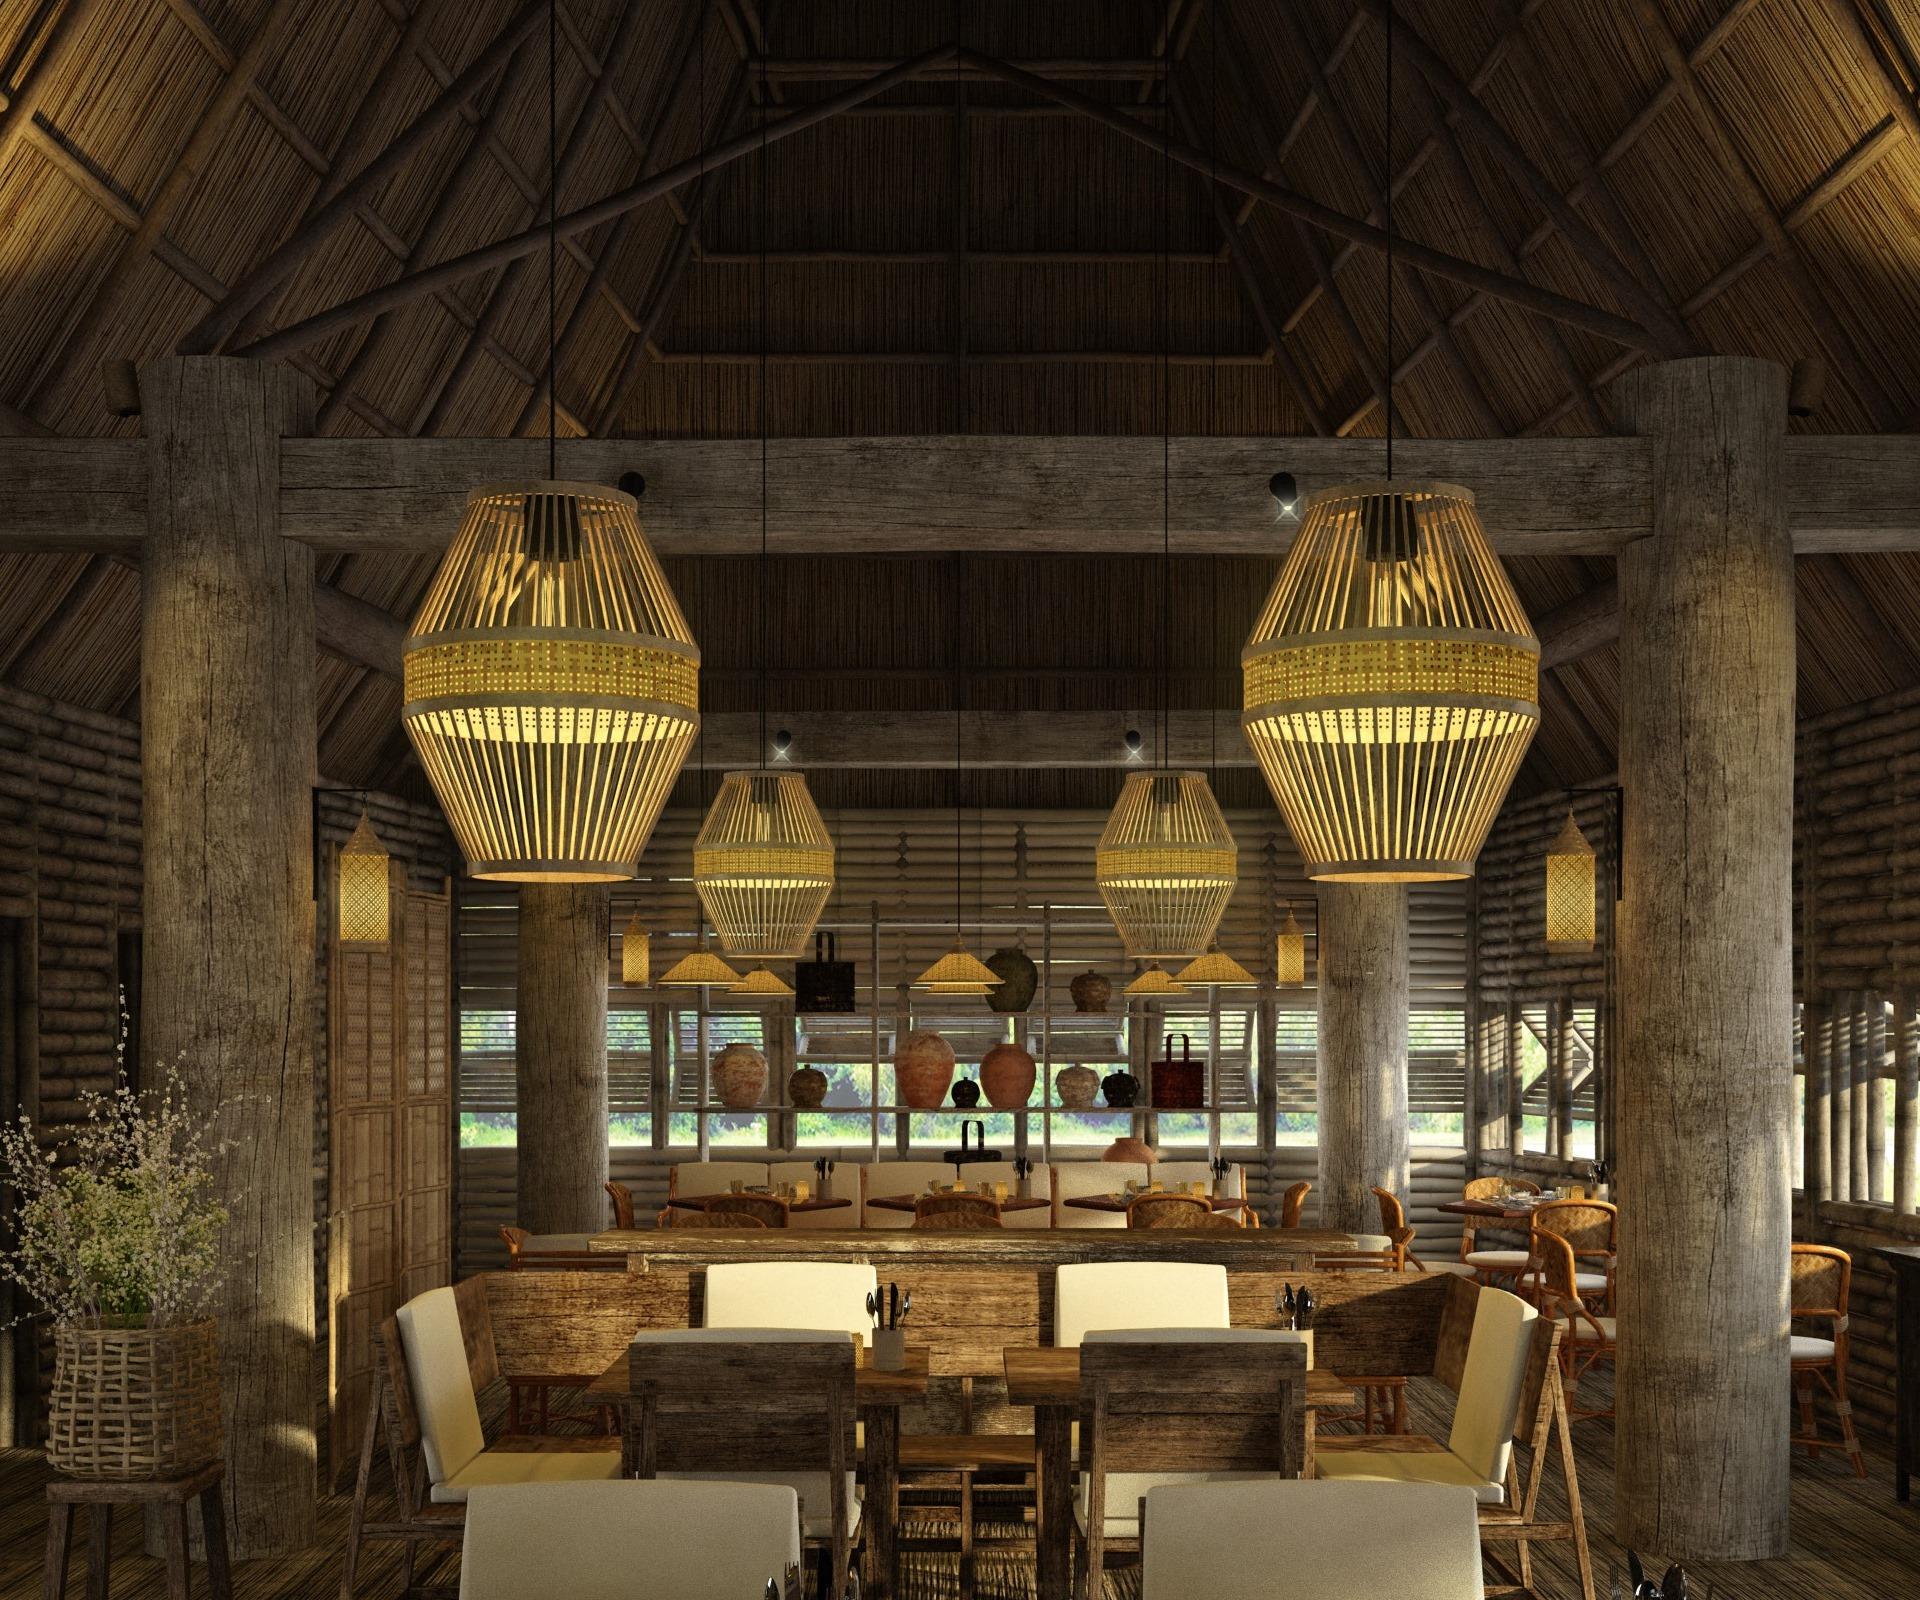 Zannier-Hotels-Bãi-San-Hô-Render-Ba-Hai-Vietnamese-Restaurant-interior-3